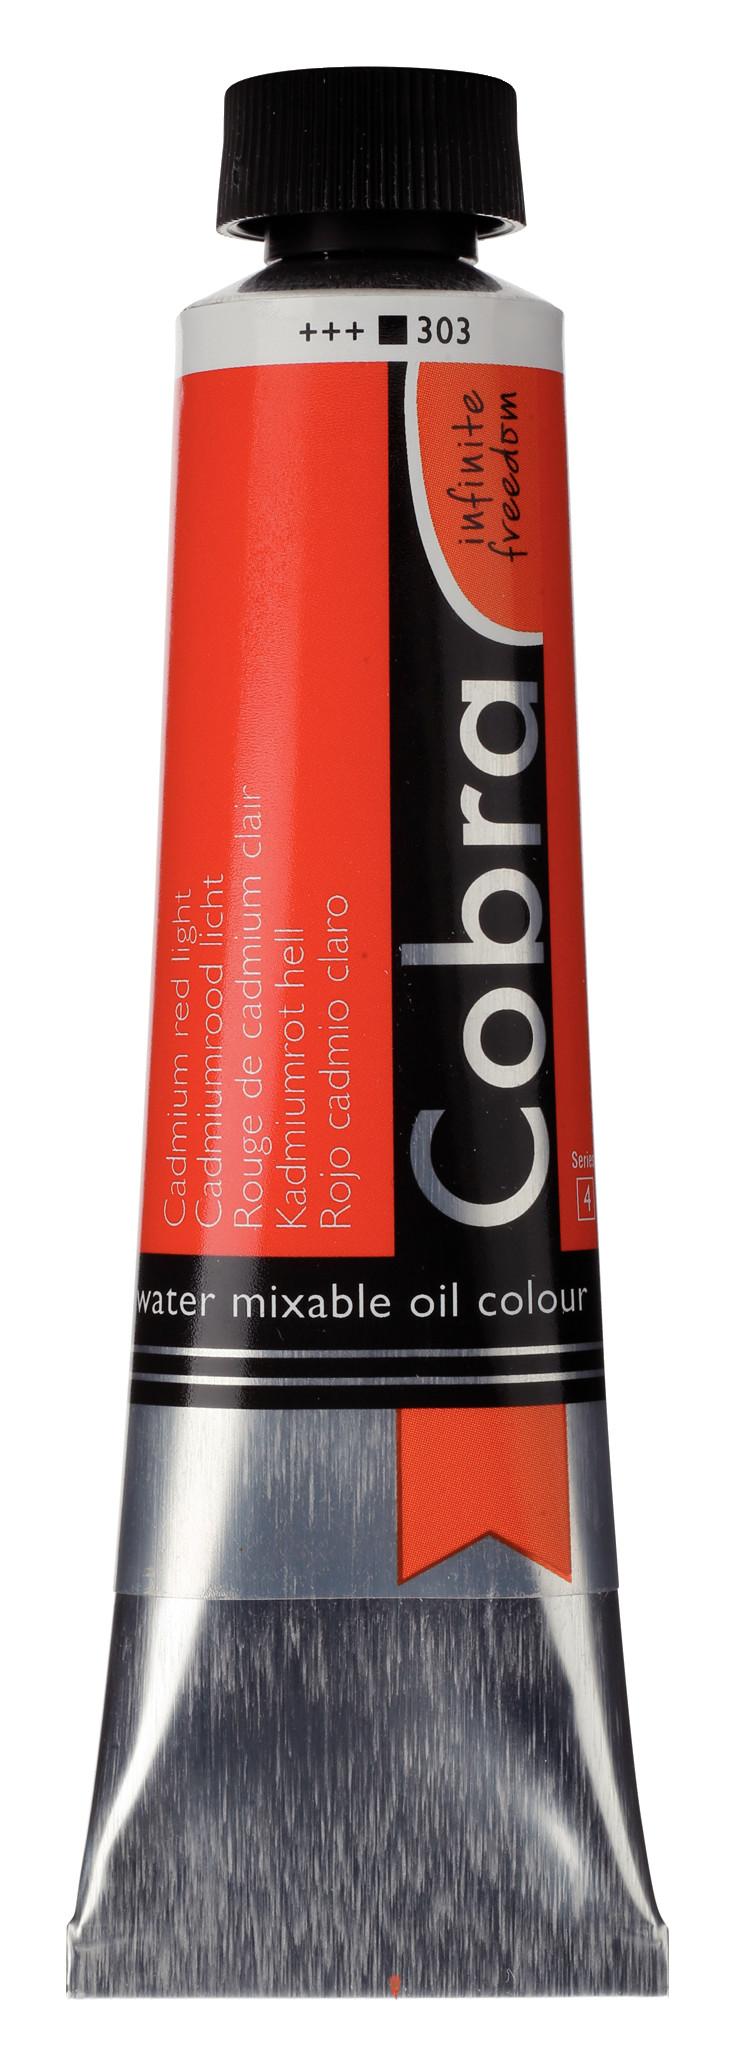 Cobra Artist Water Mixable Oil Colour Tube 40 ml Cadmium red light 303